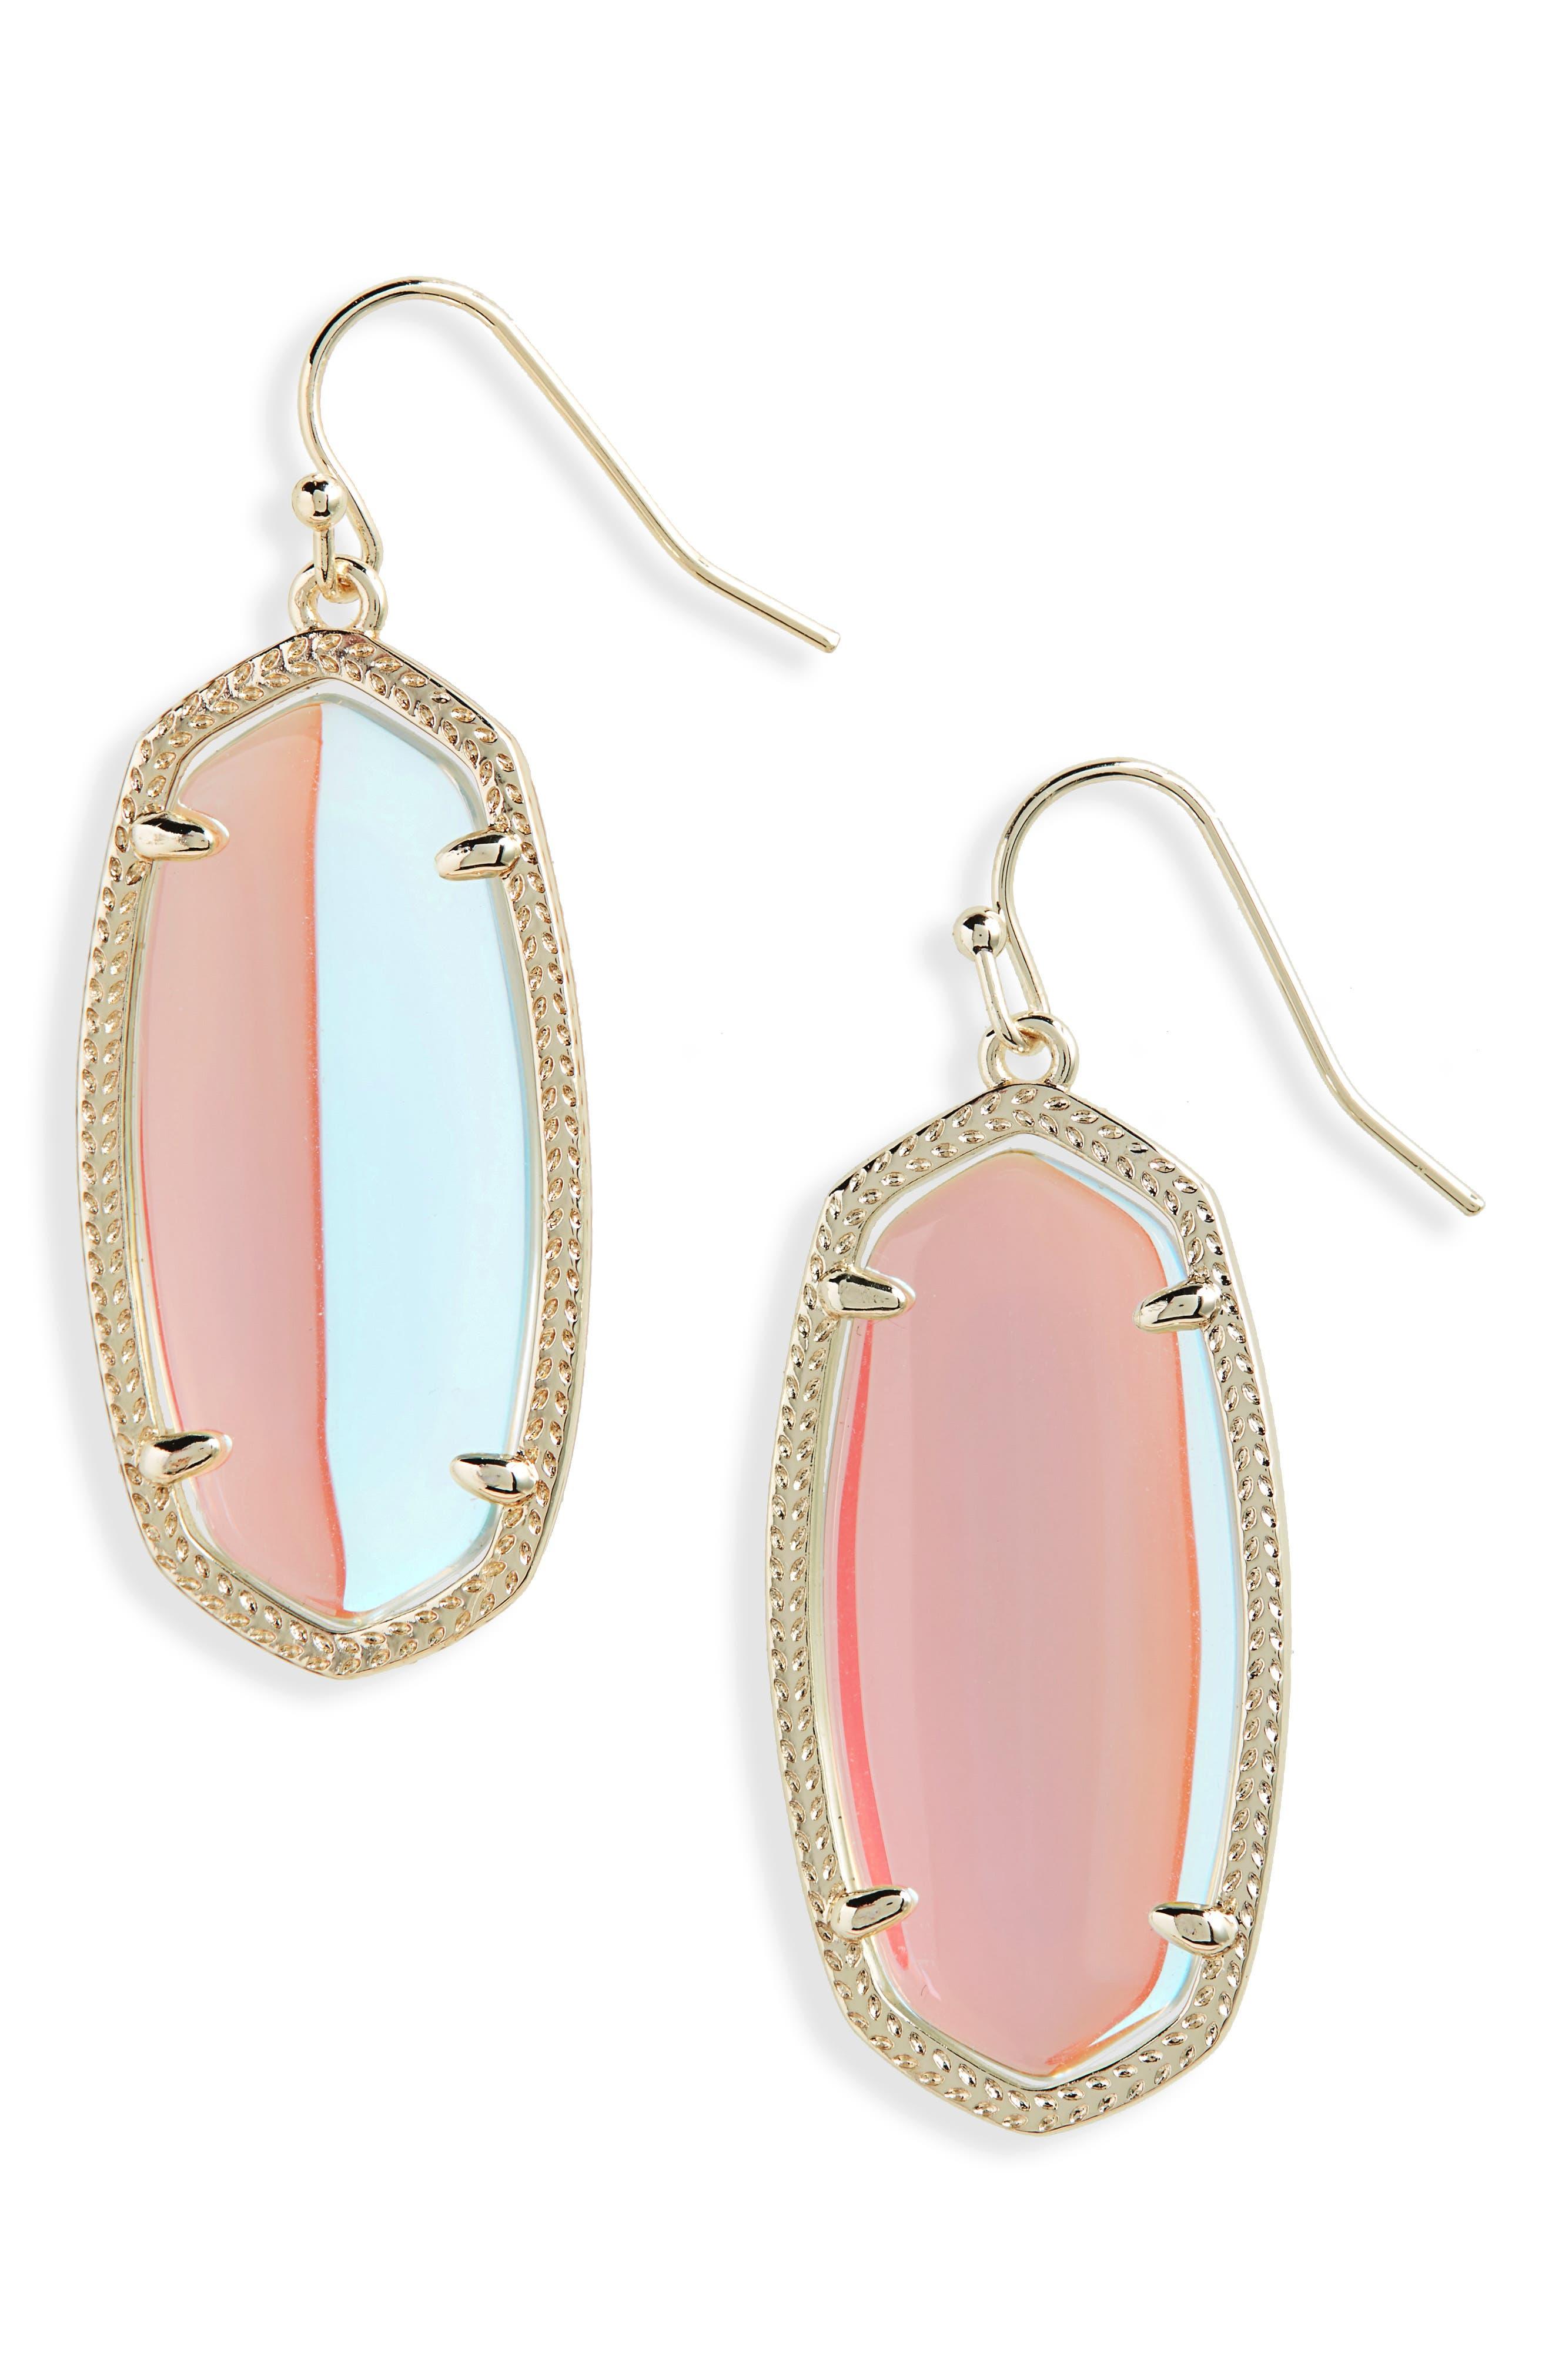 Elle Drop Earrings,                             Main thumbnail 1, color,                             Dichroic Glass/ Gold